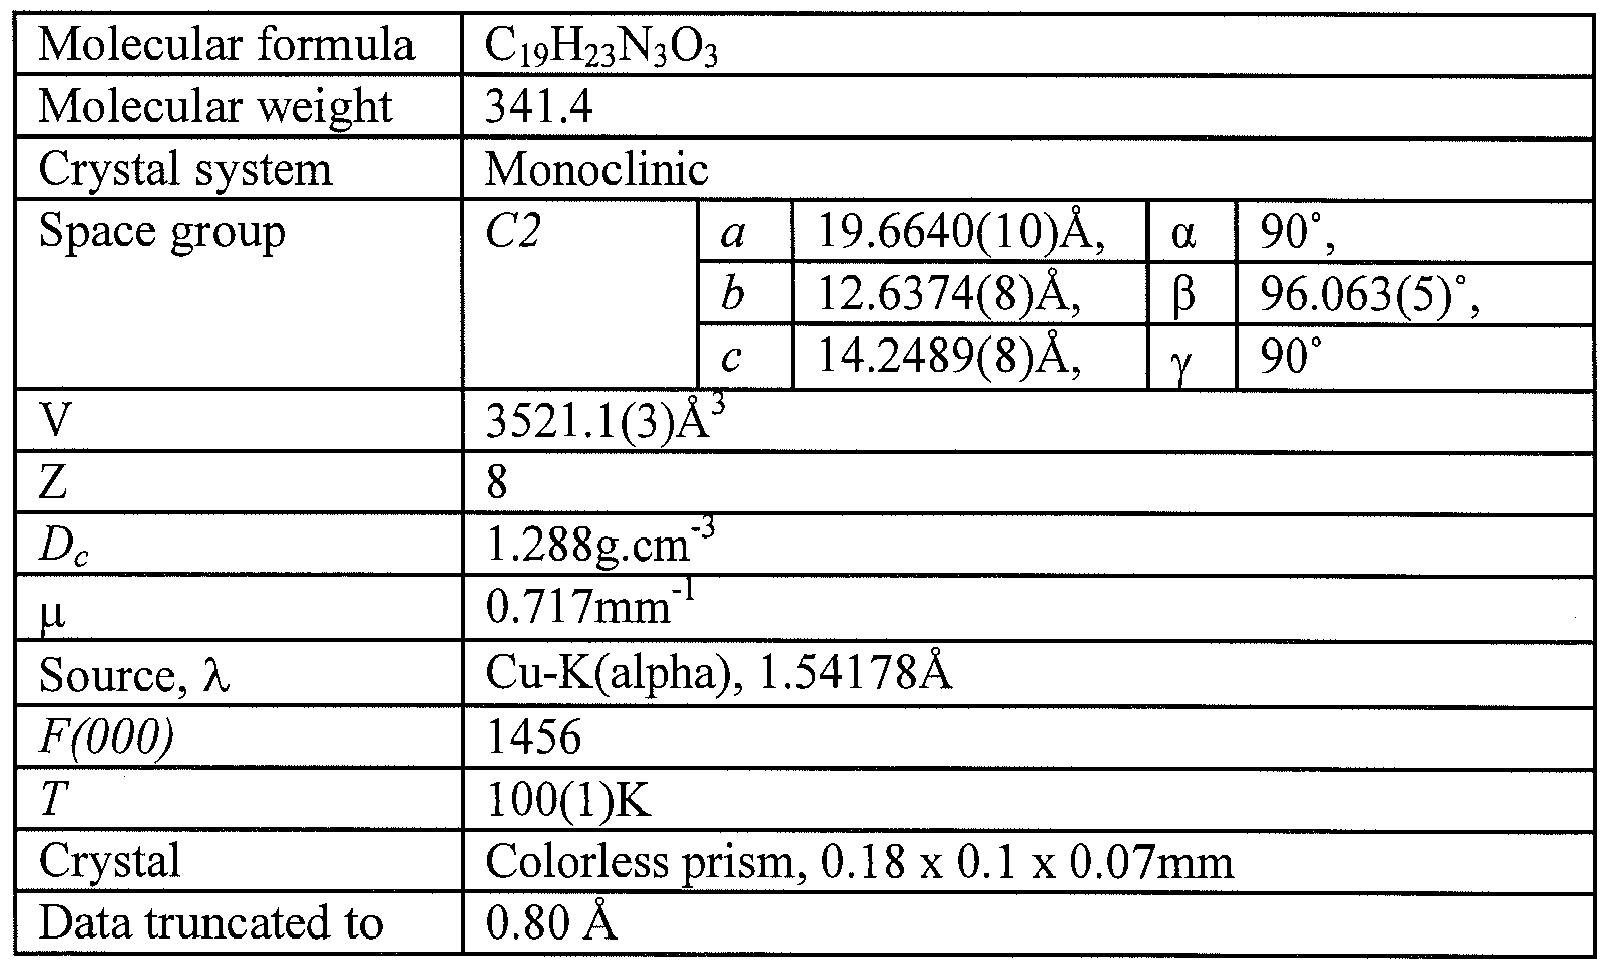 WO2015183801A1 - Nicotine salts, co-crystals, and salt co-crystal